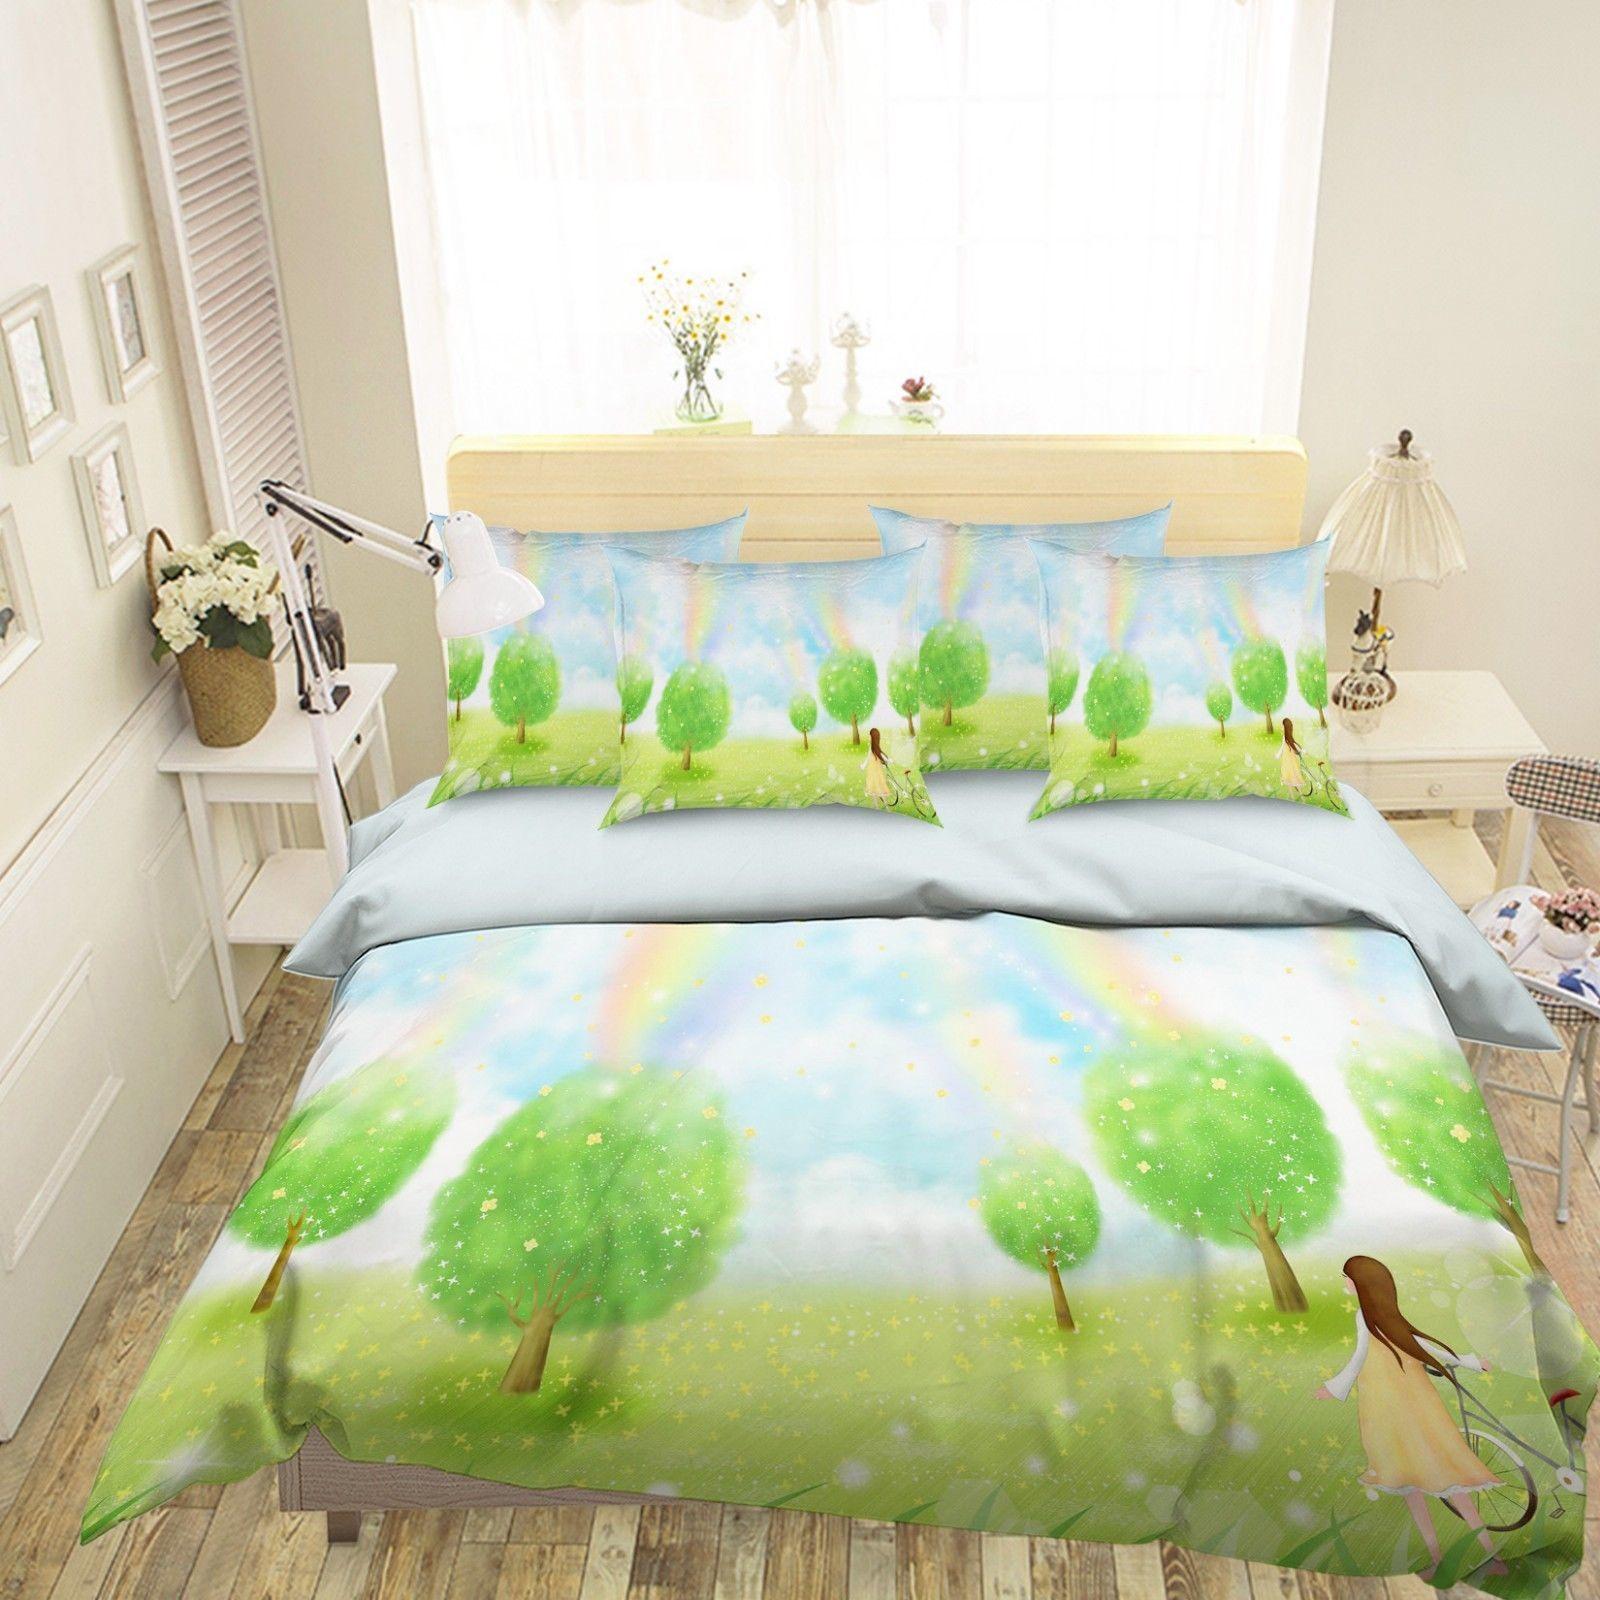 3D Green Tree Rainbow 2 Bed Pillowcases Quilt Duvet Single Queen King US Lemon - $102.84 - $158.94